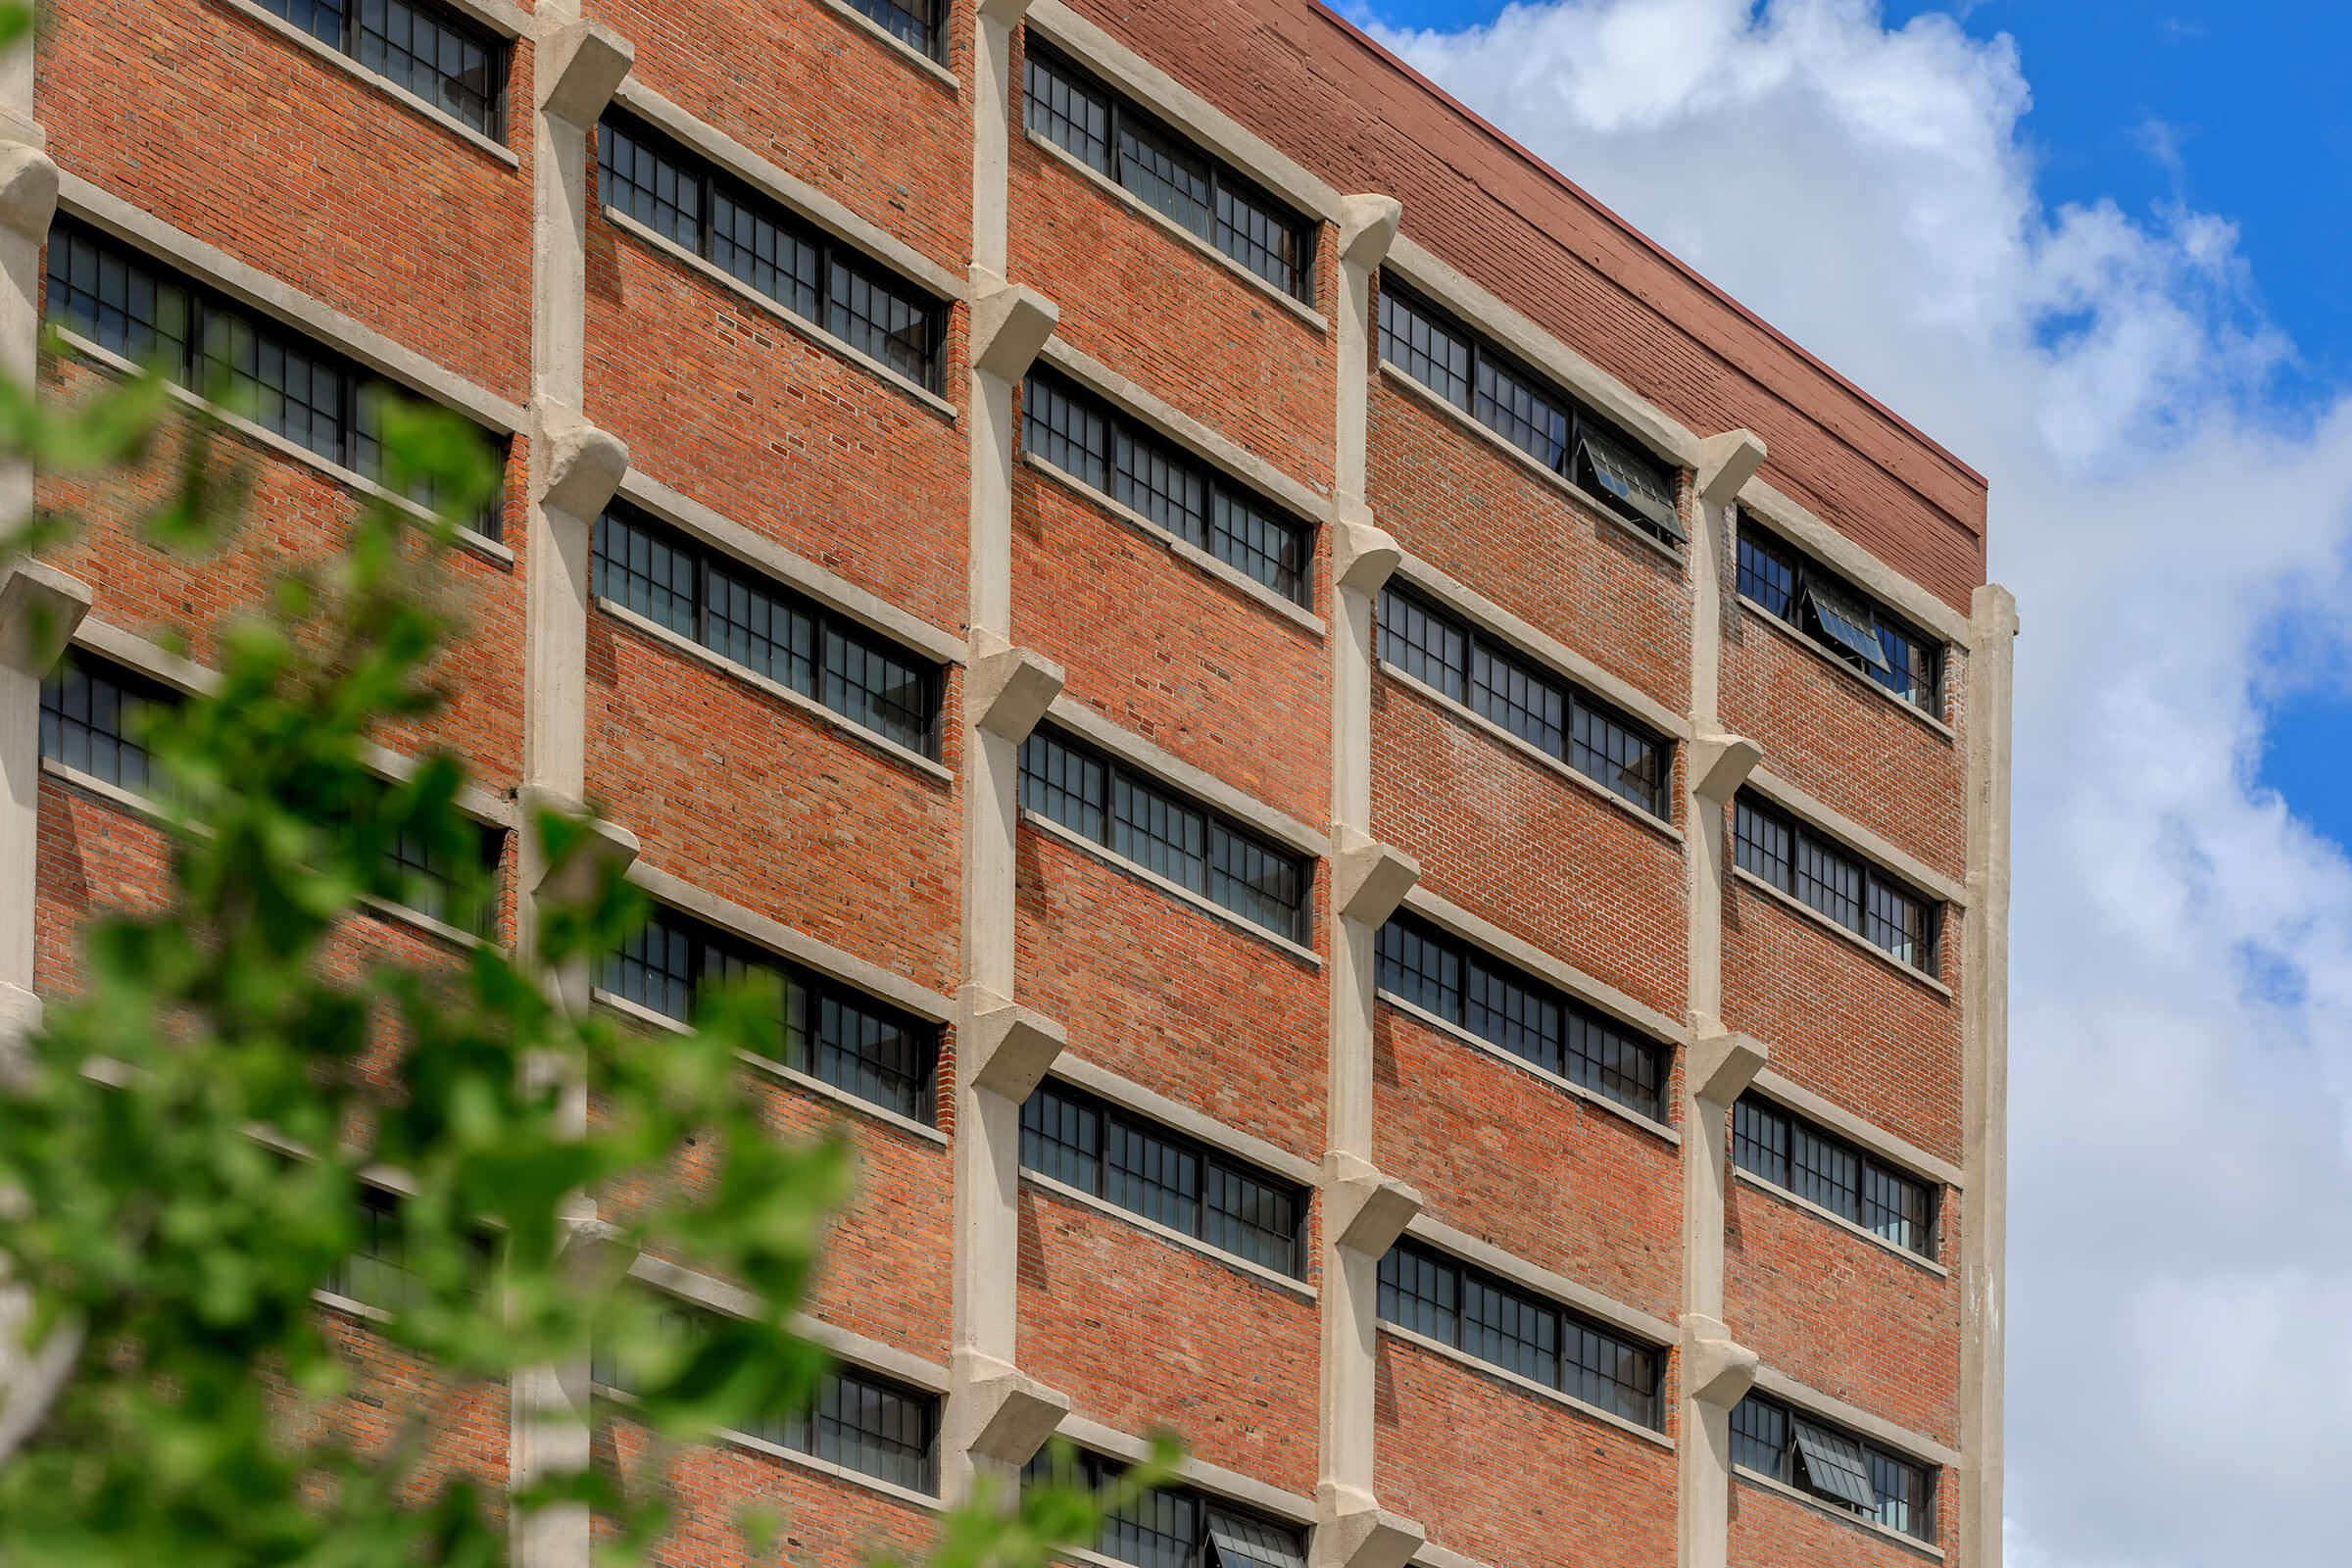 a tall brown brick building